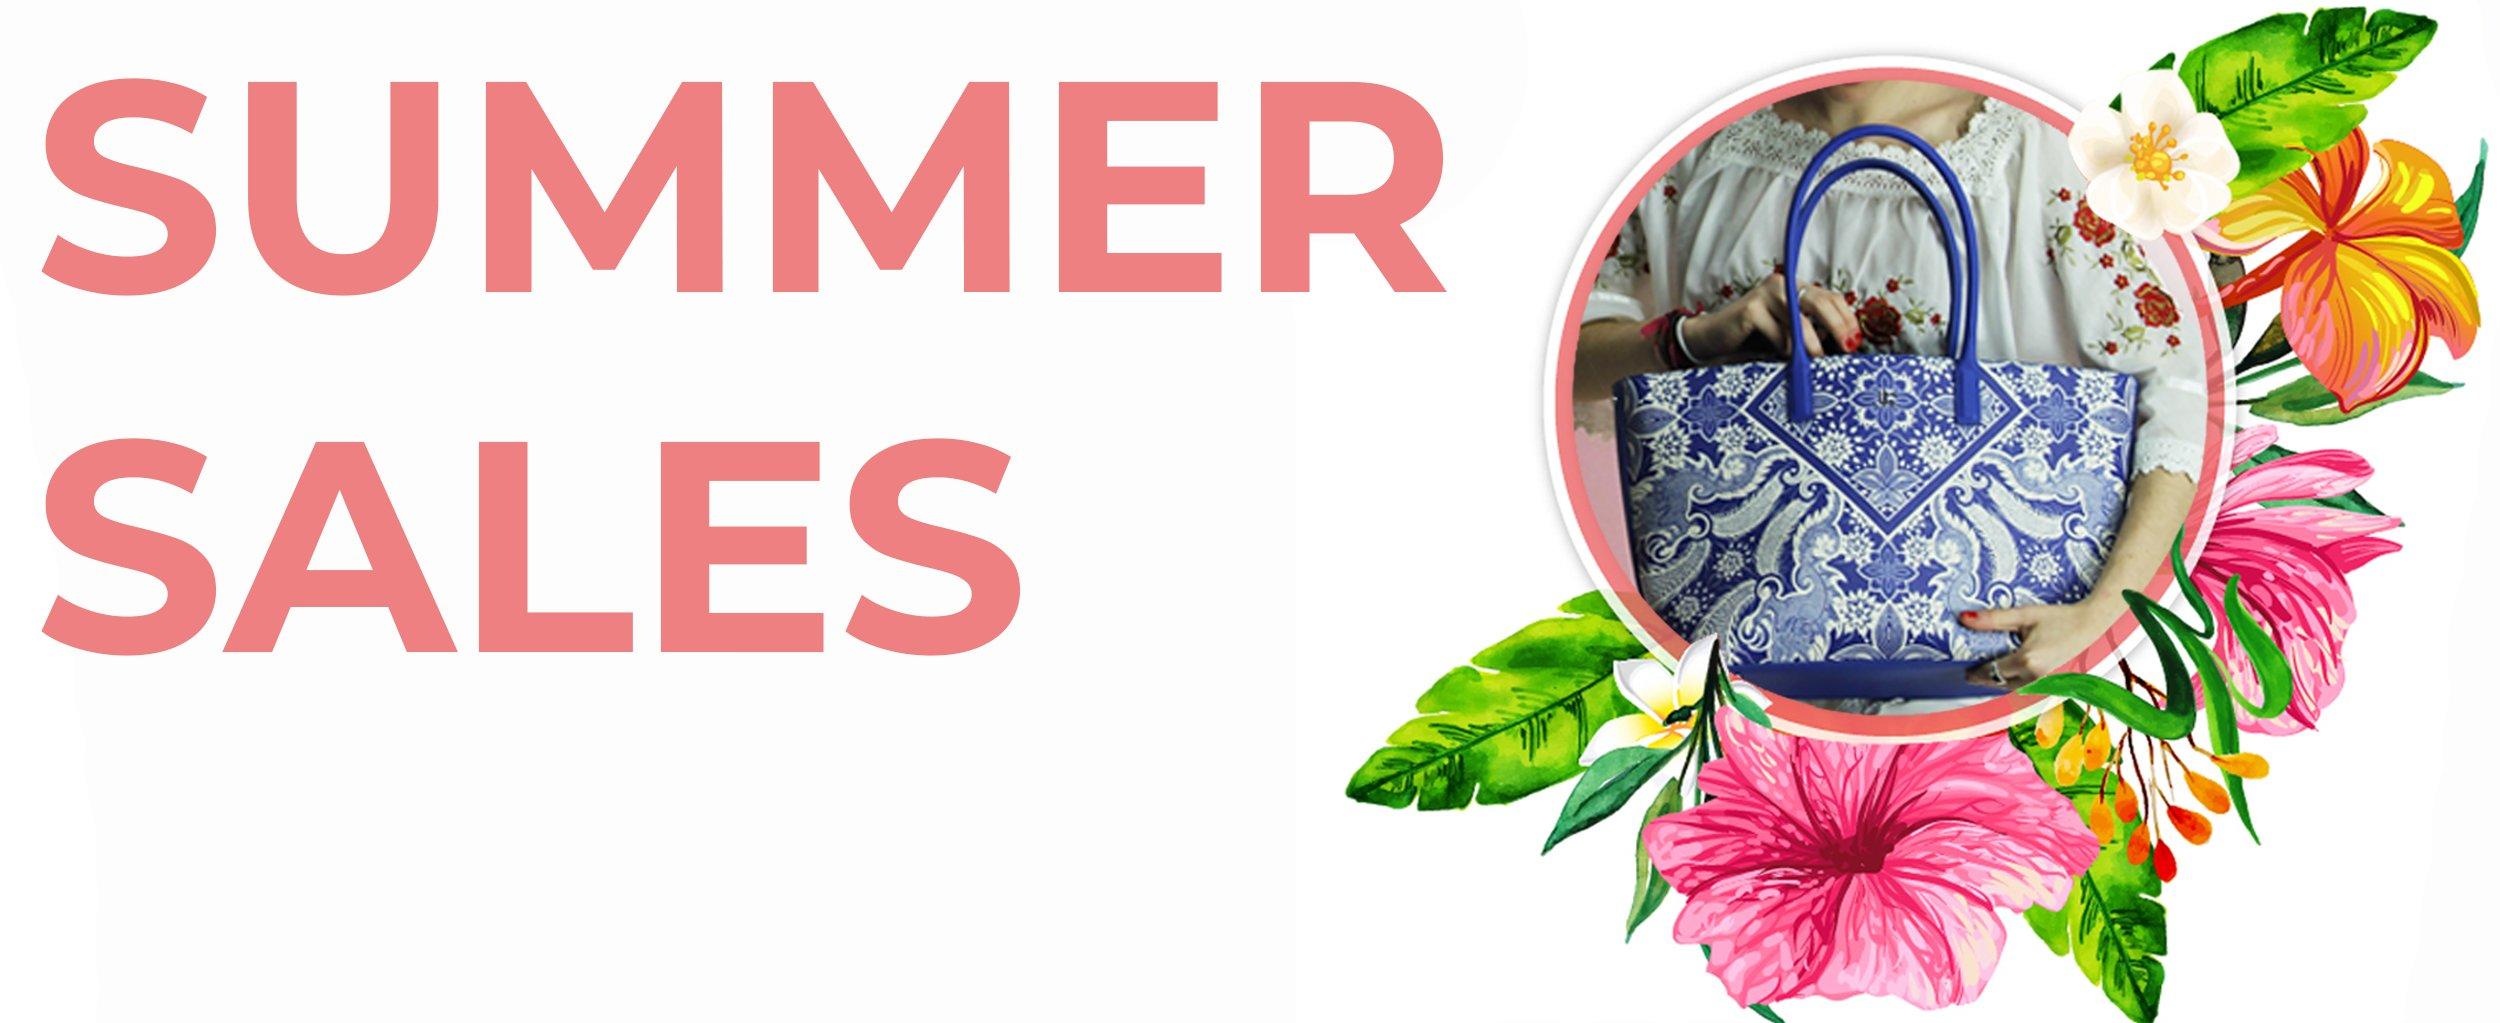 Summer Sales John Richmond